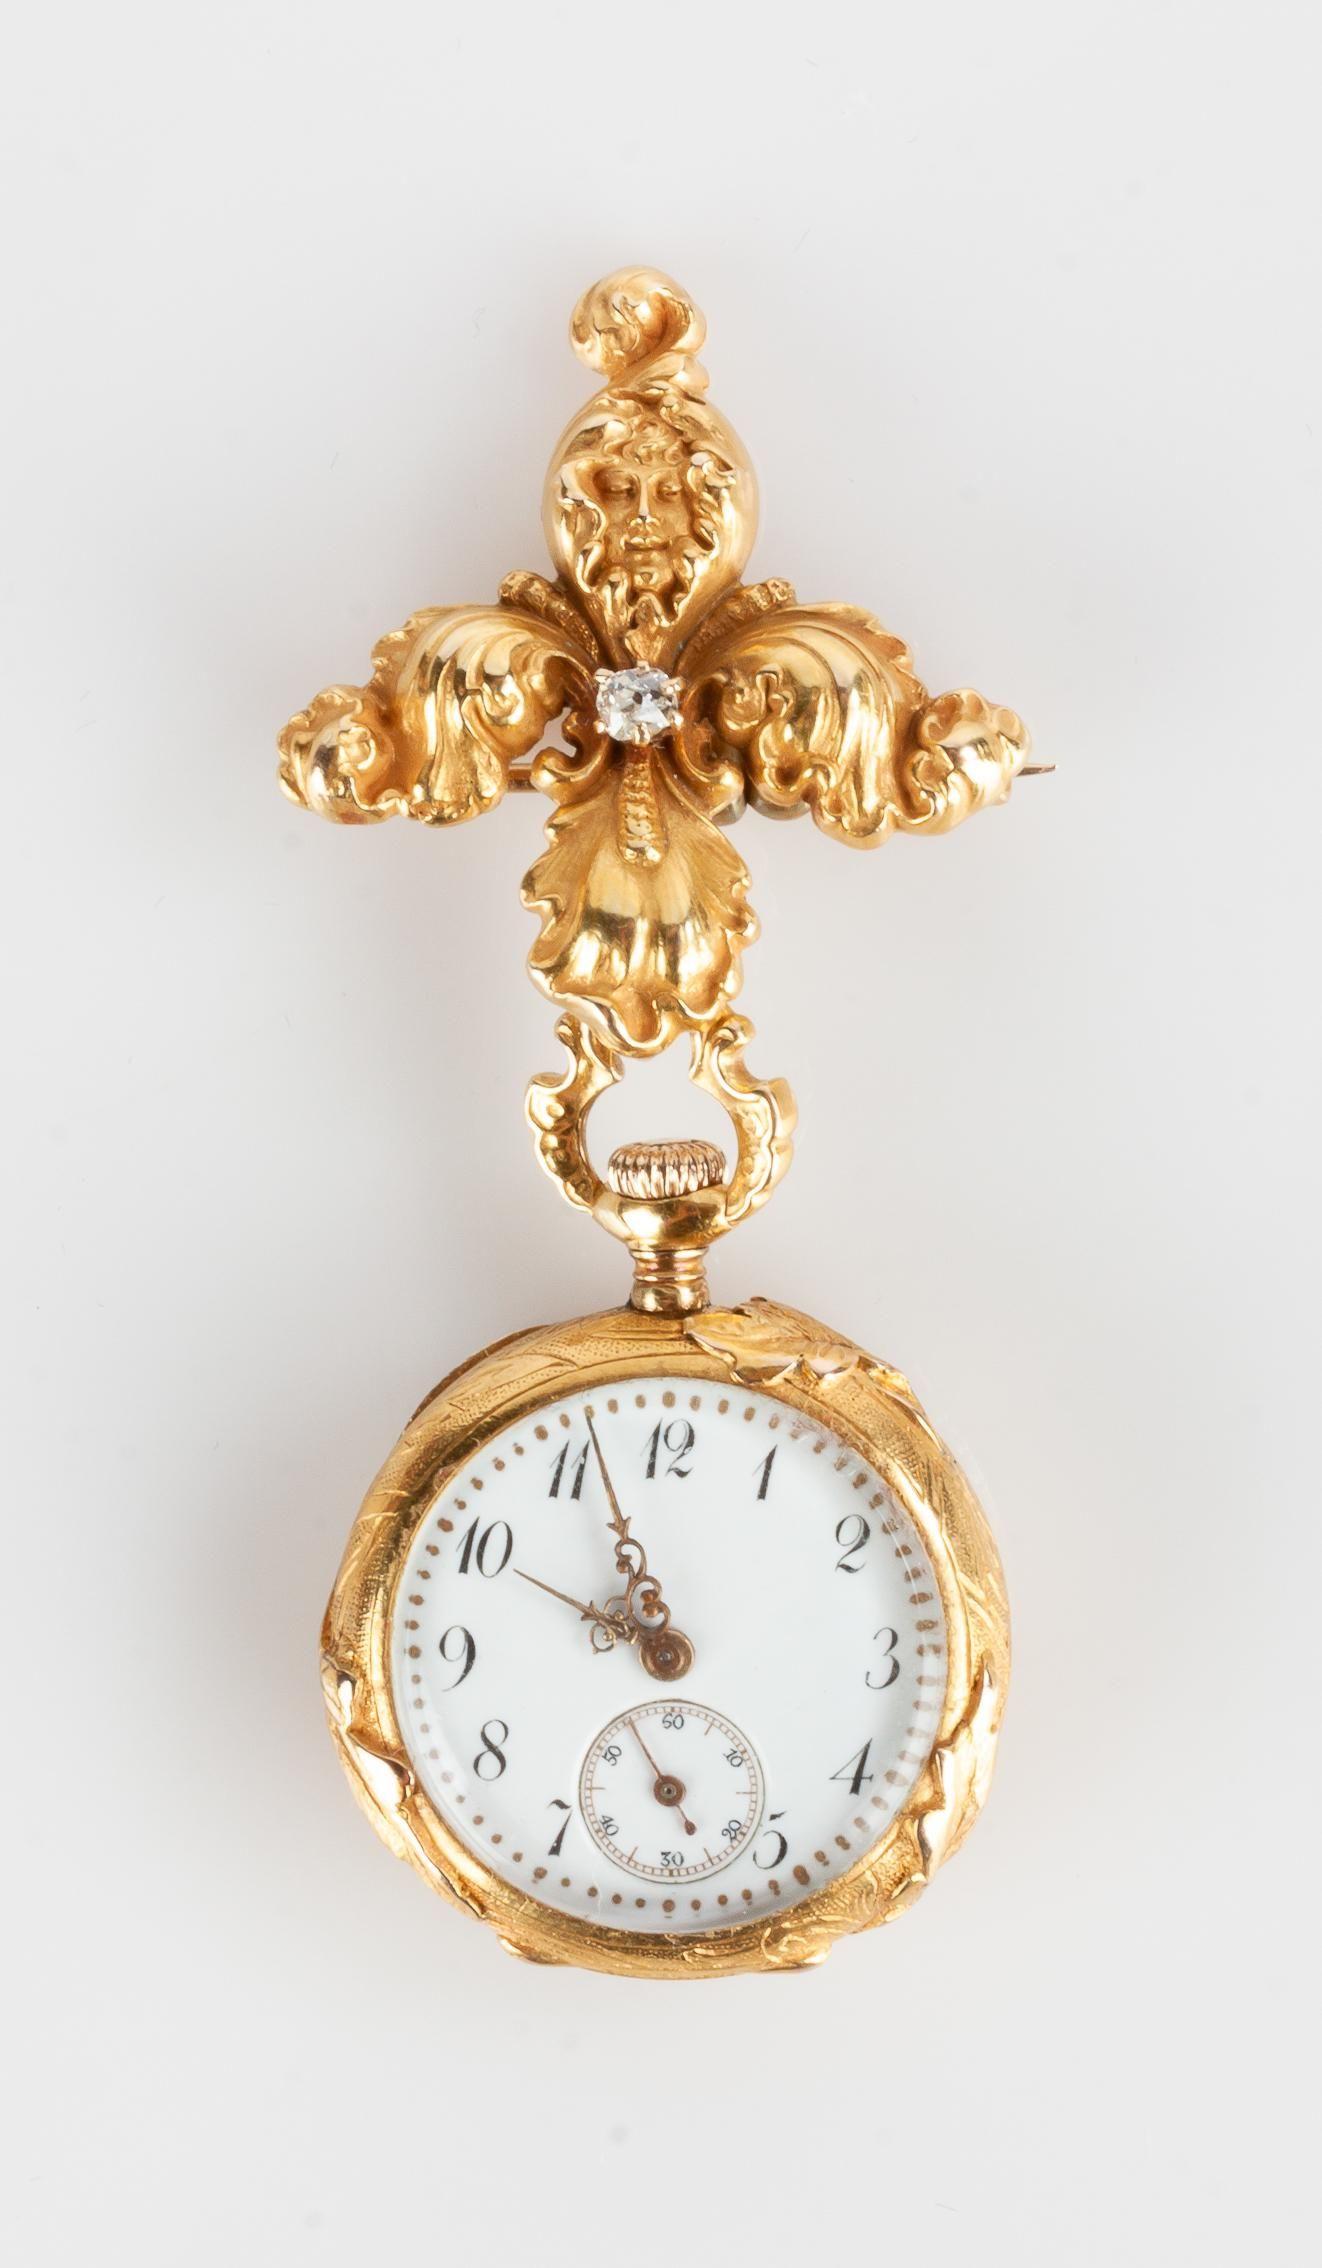 14k Gold and Diamond Pendant Watch Brooch